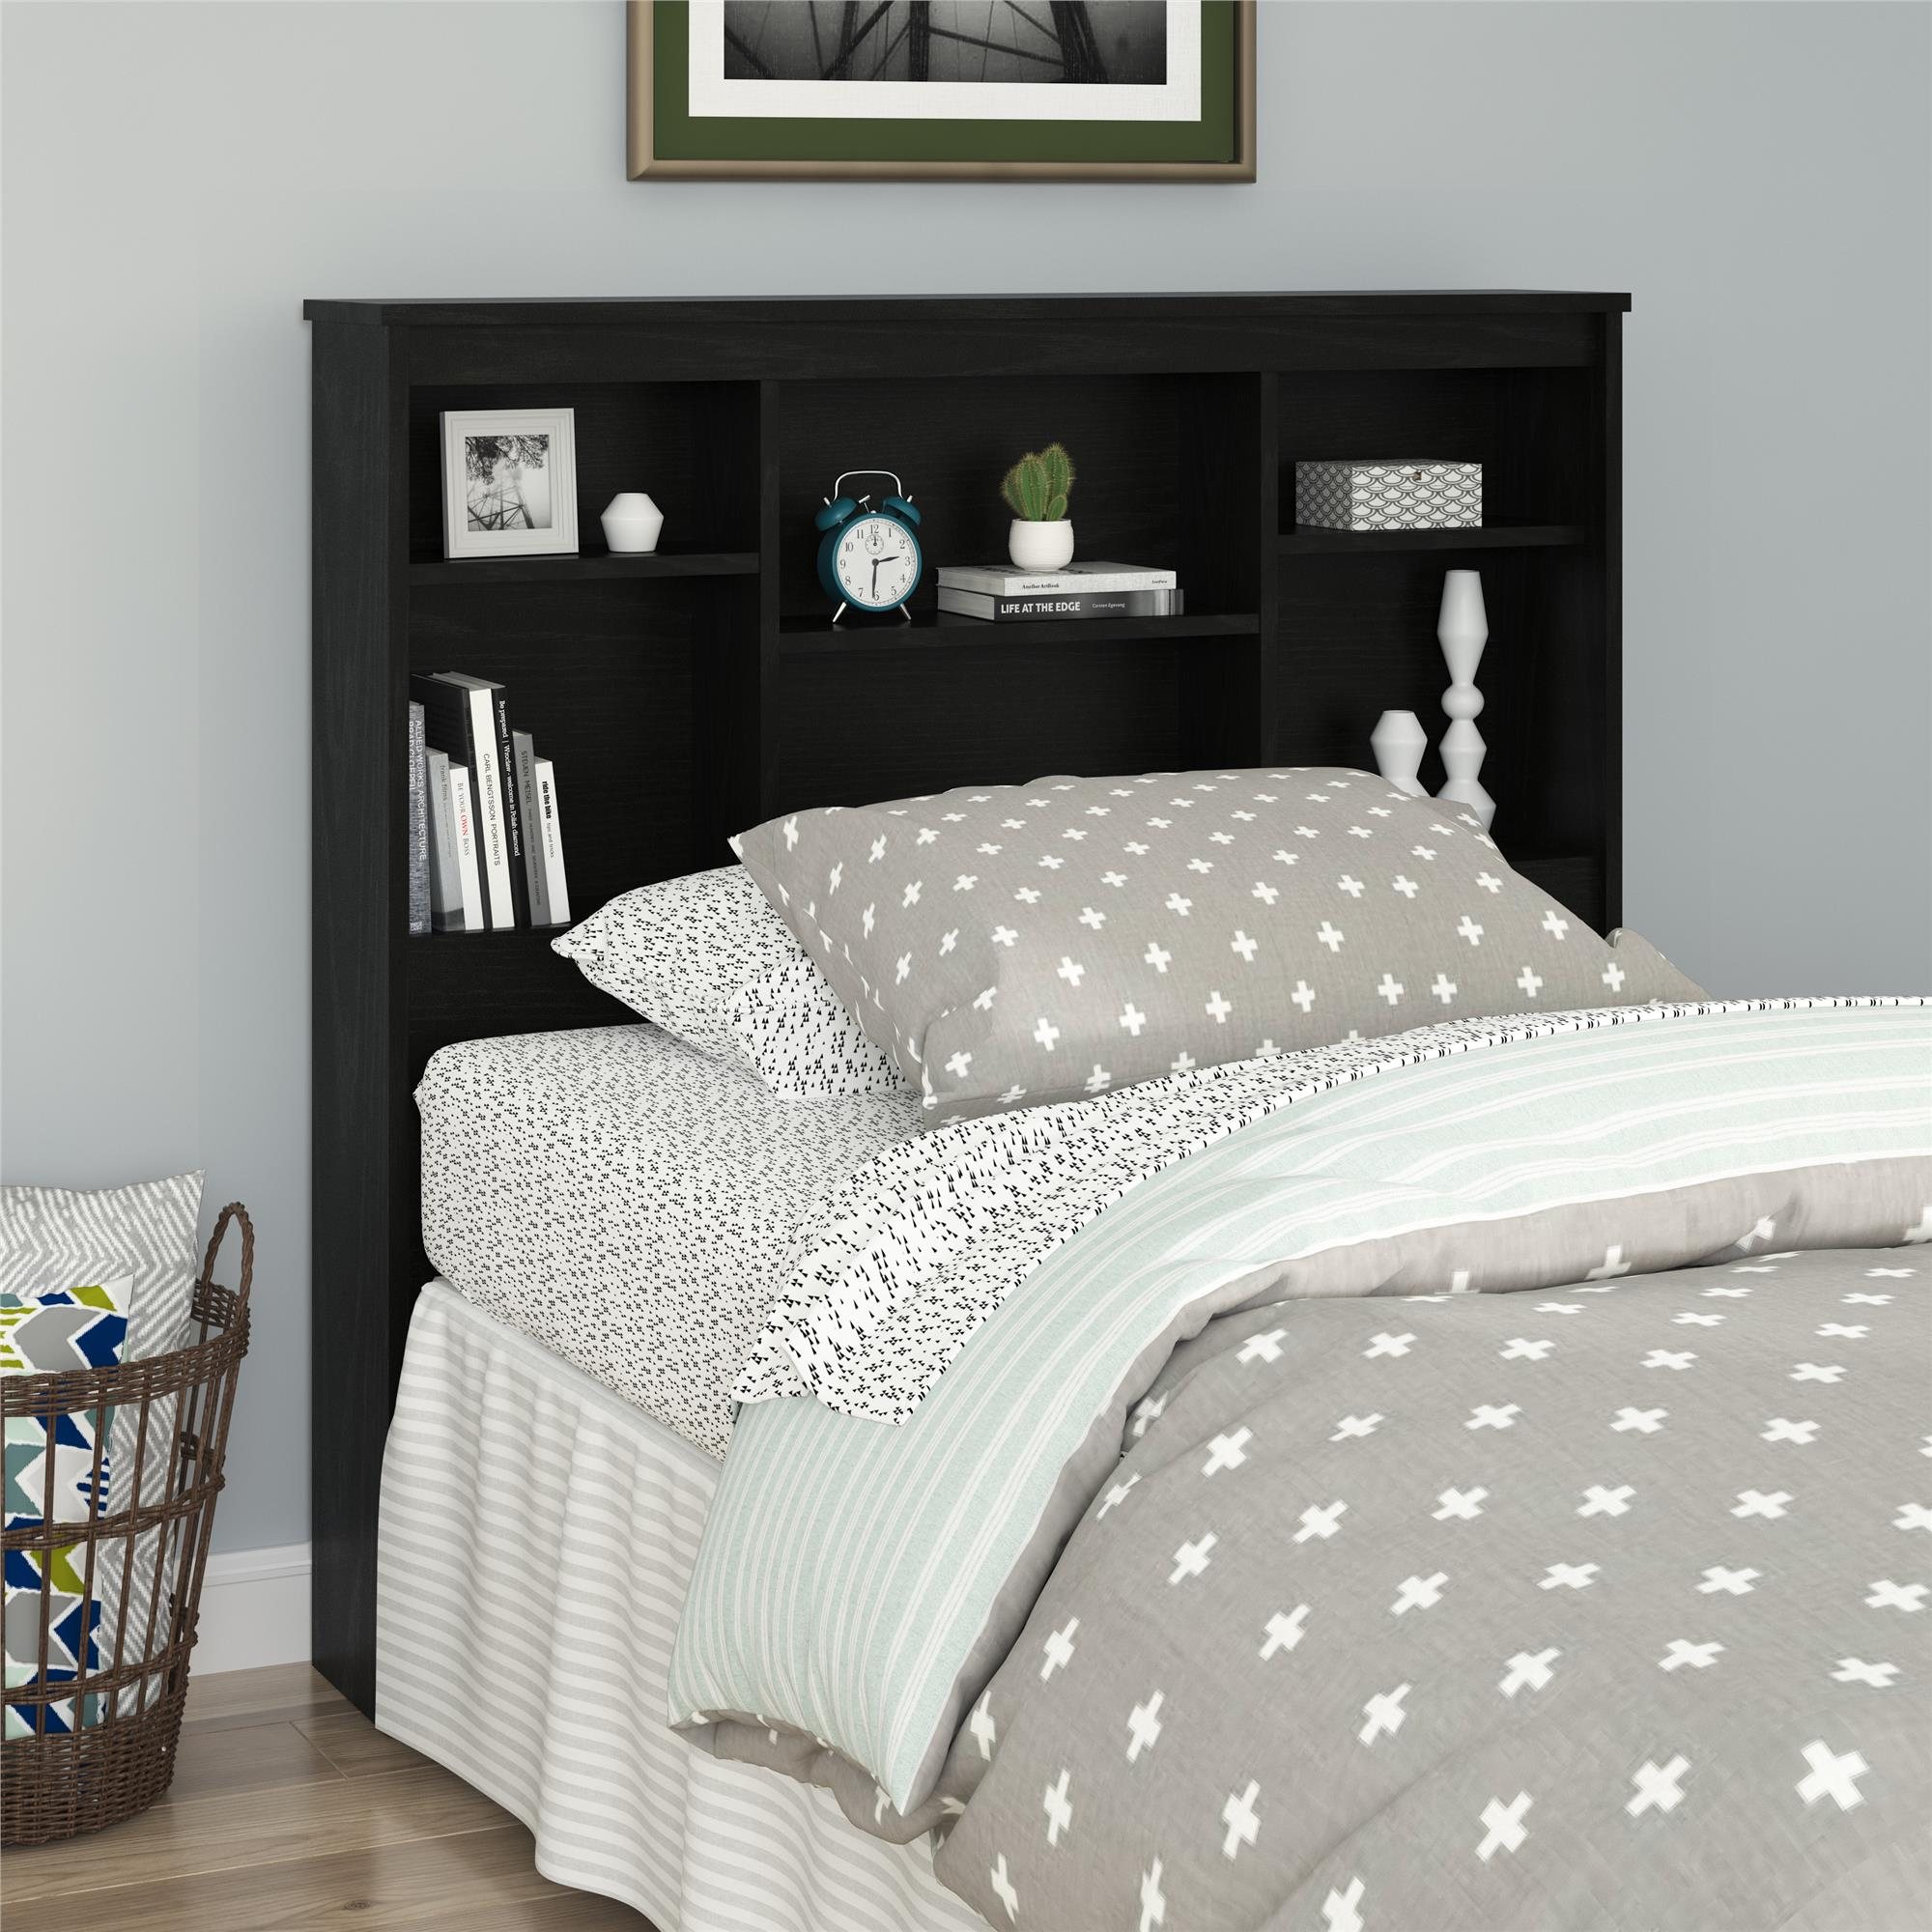 Mainstays Twin Storage Headboard, Nightfall Oak